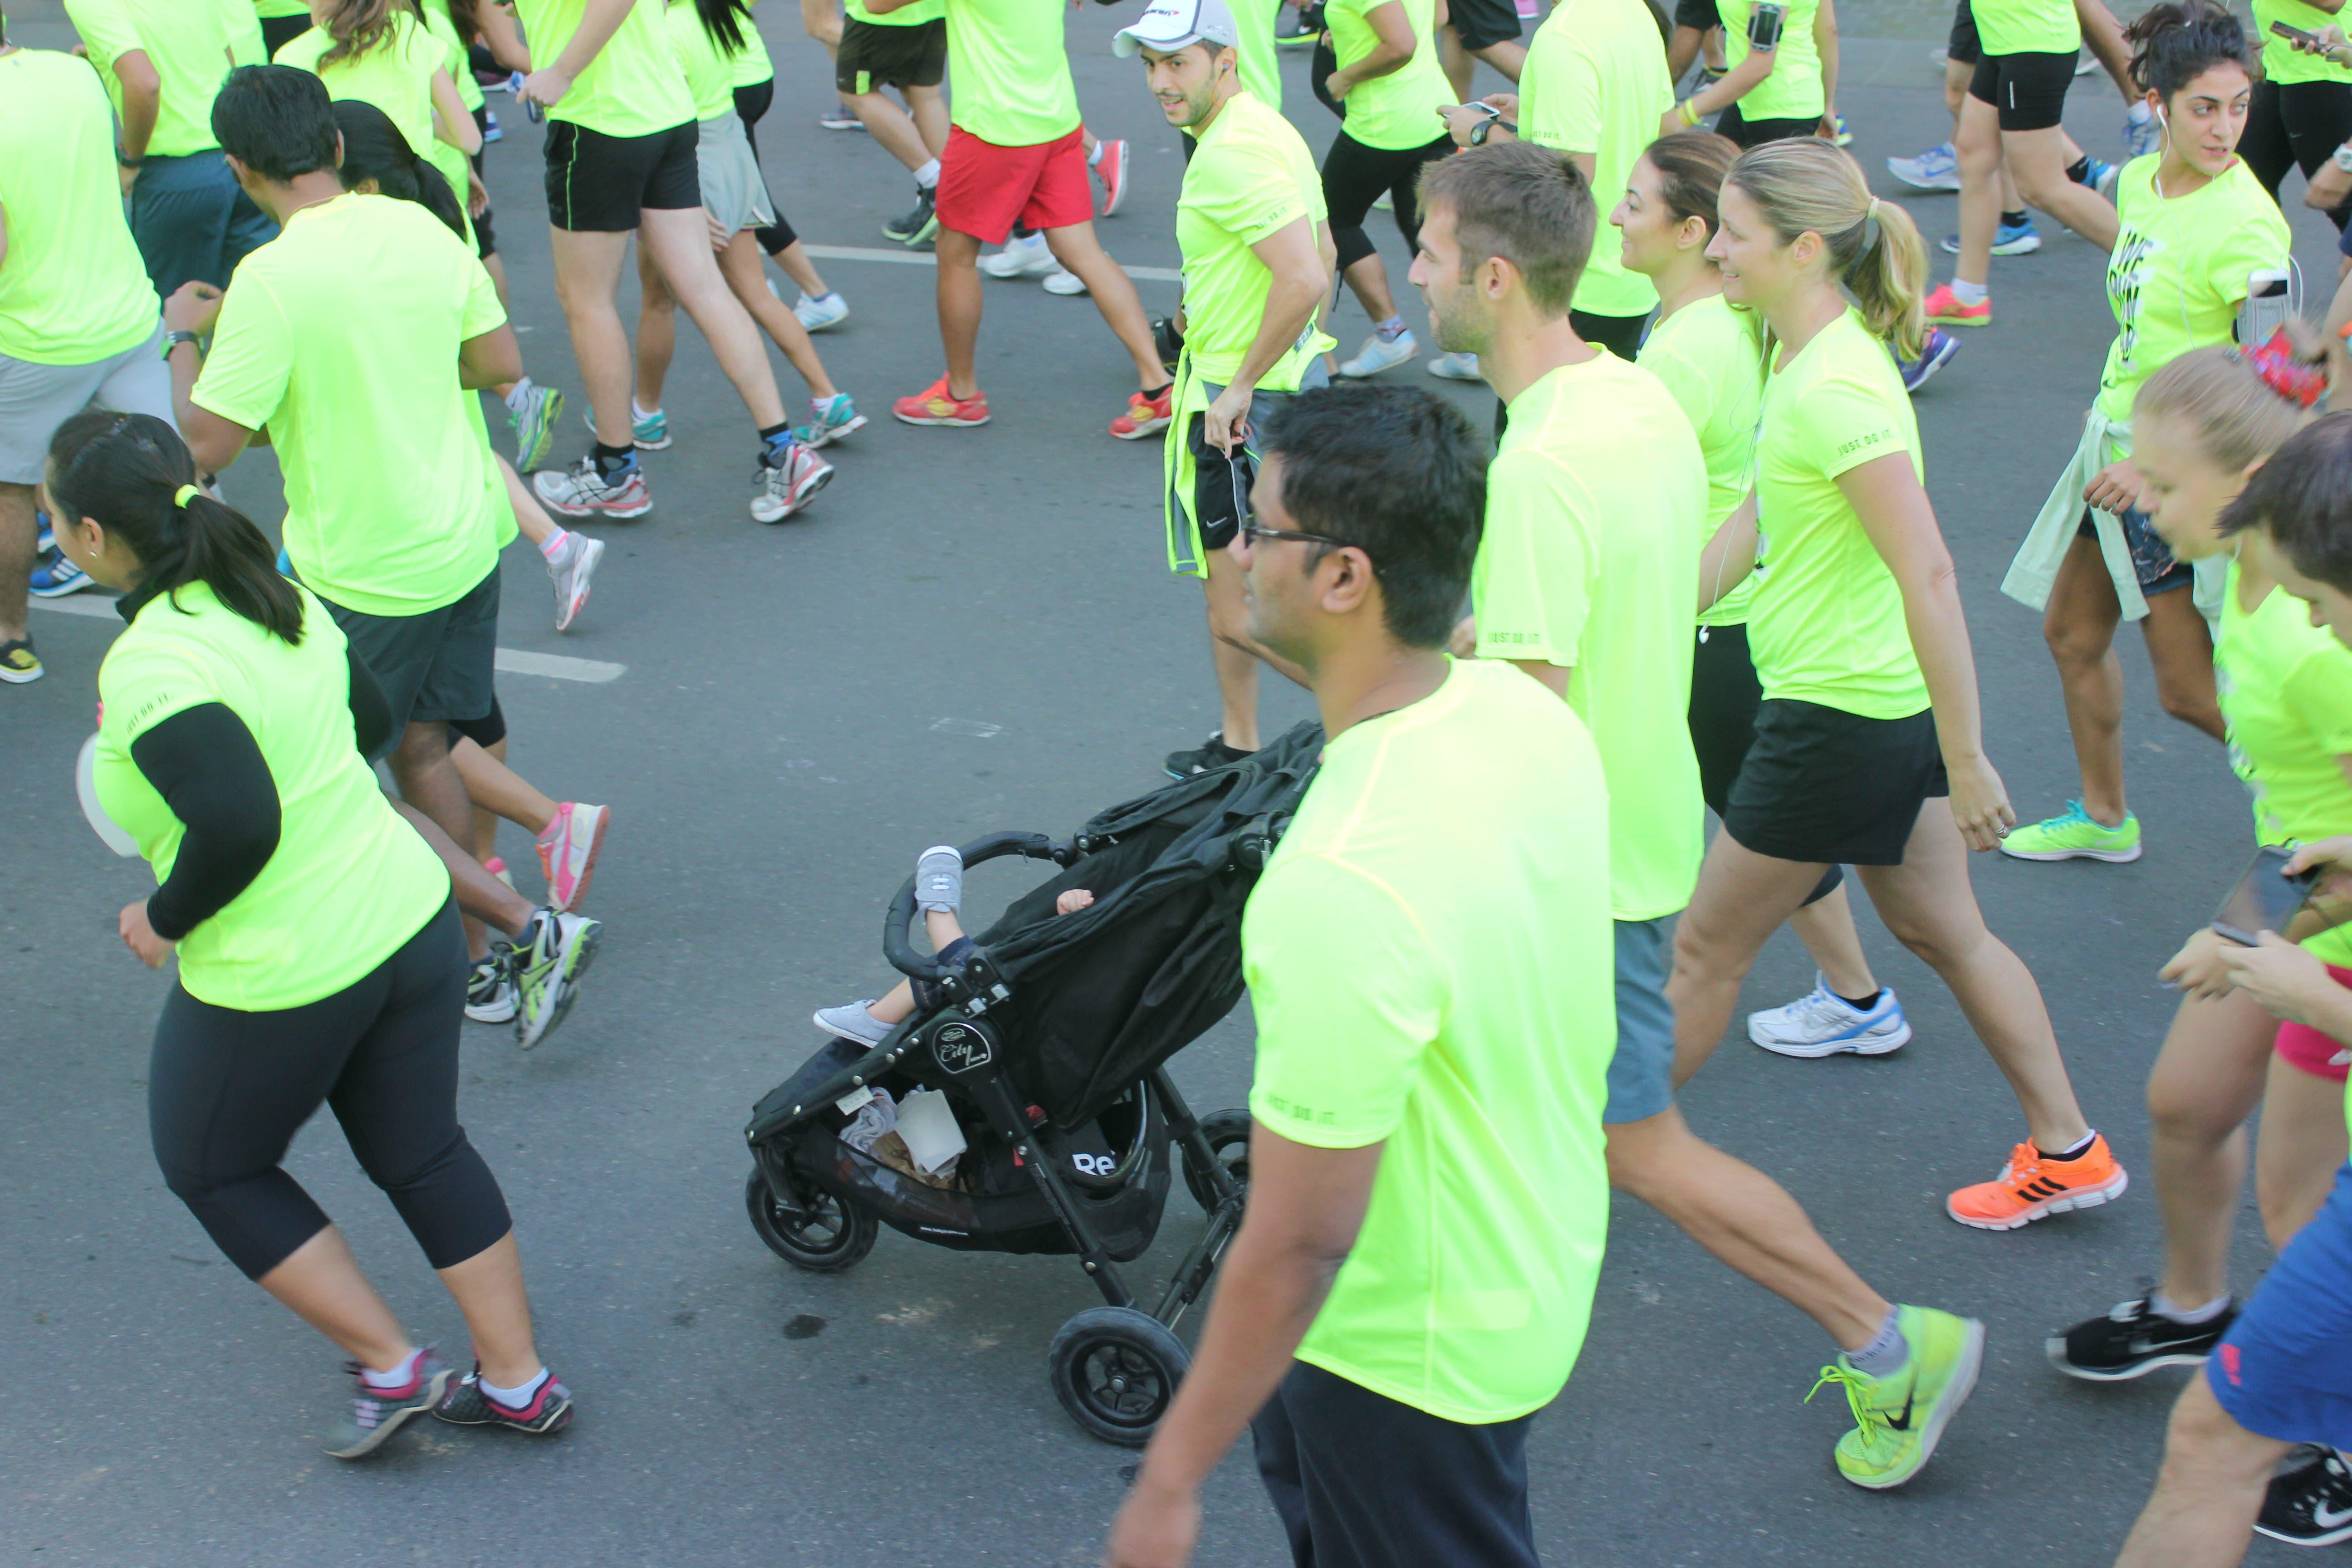 nike run baby stroller photo: al arabiya news/salma el shahed